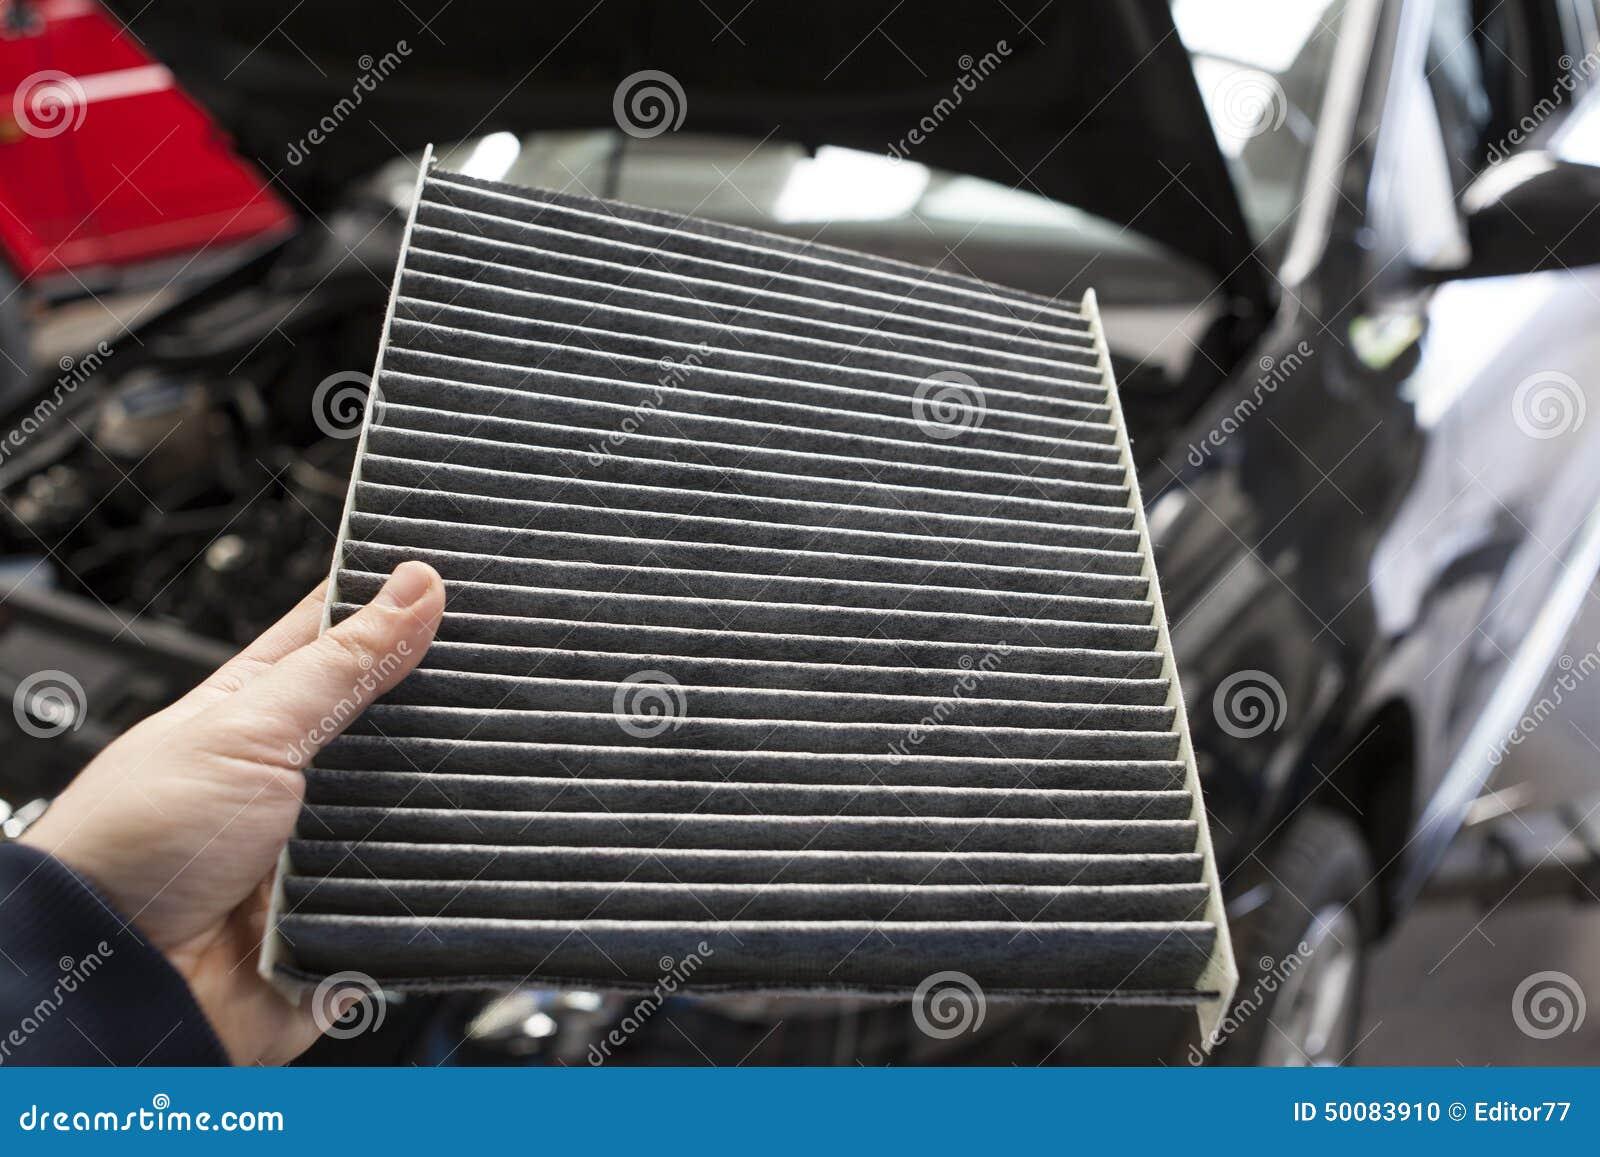 car pollen filter stock photo image 50083910